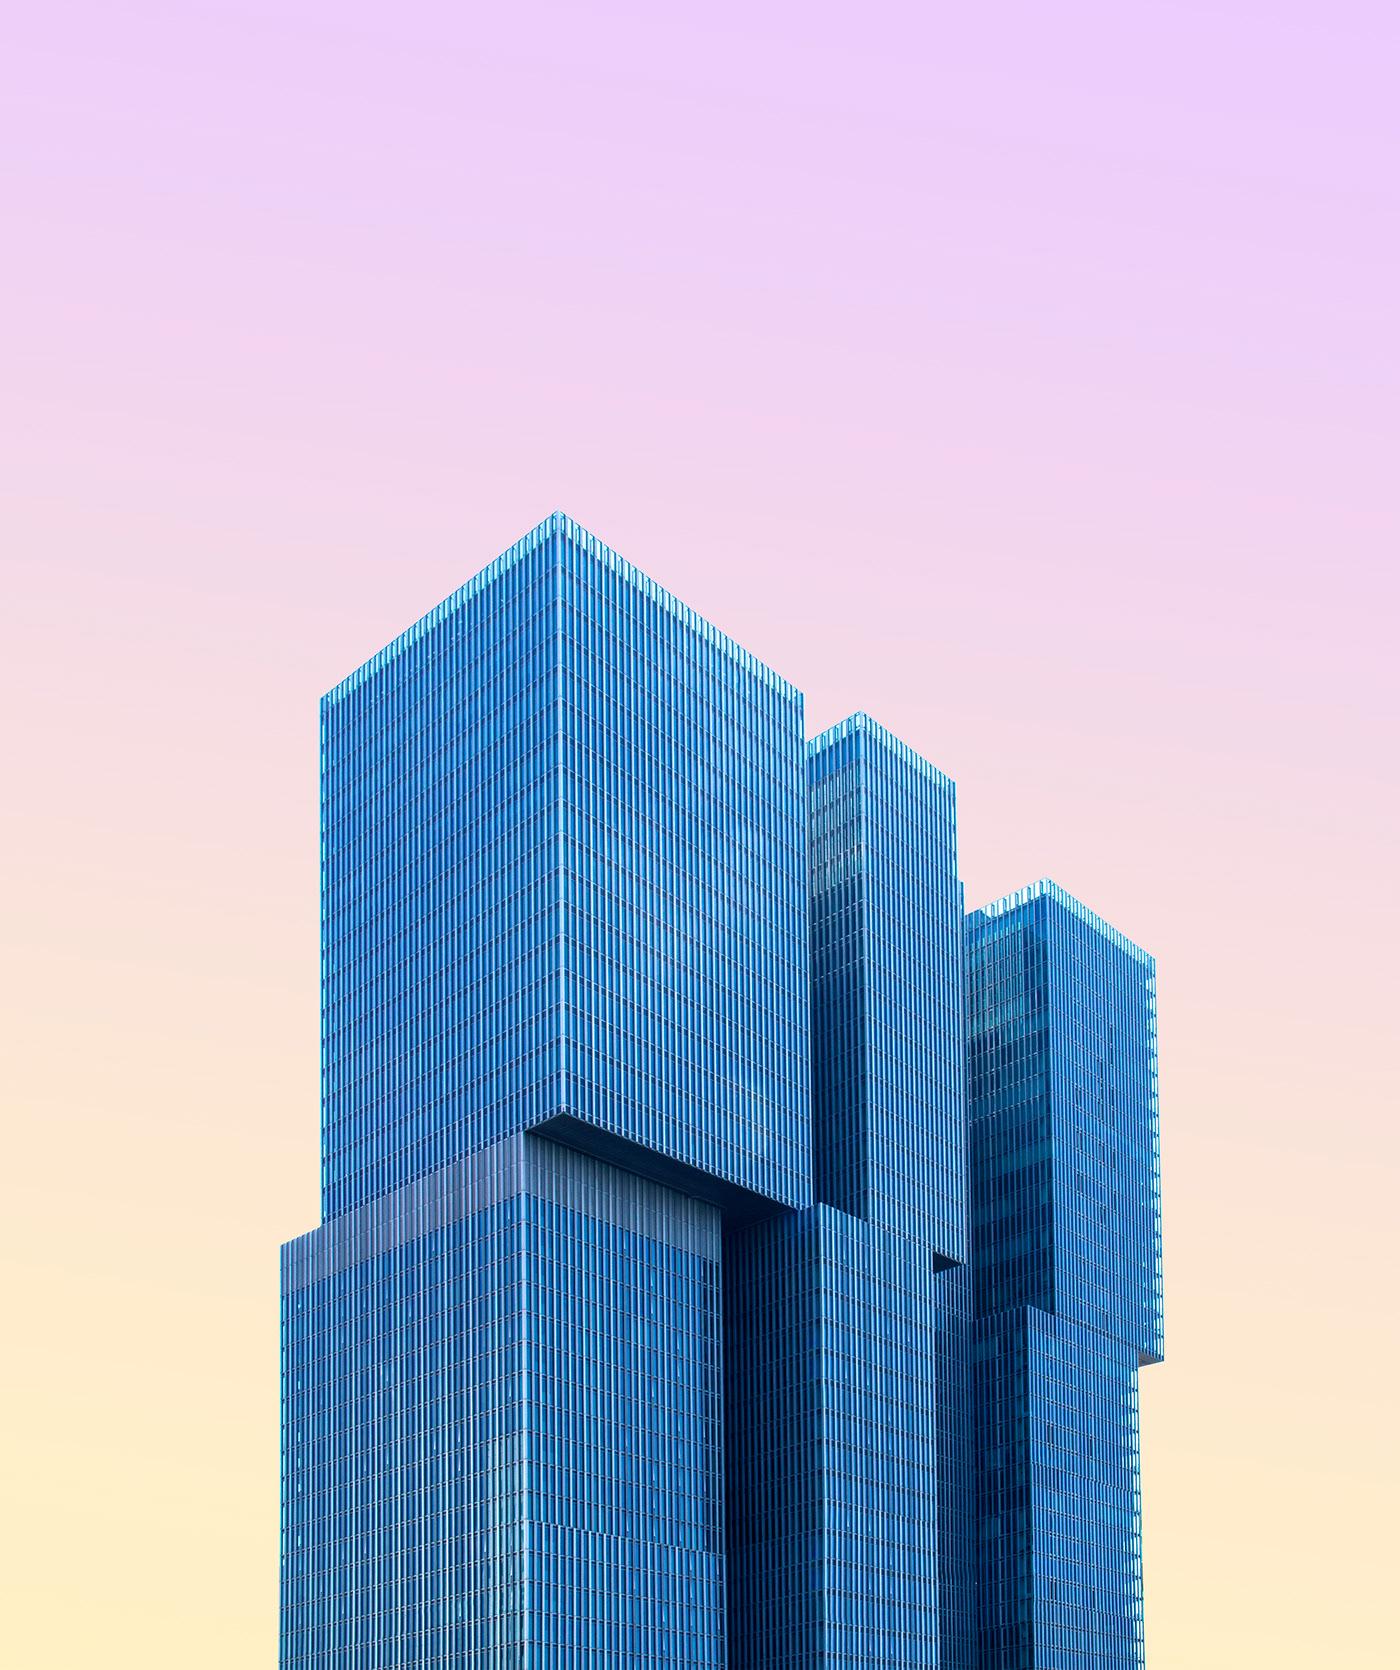 minimal architecture city Rotterdam pastel Minimalism geometry building SKY Urban